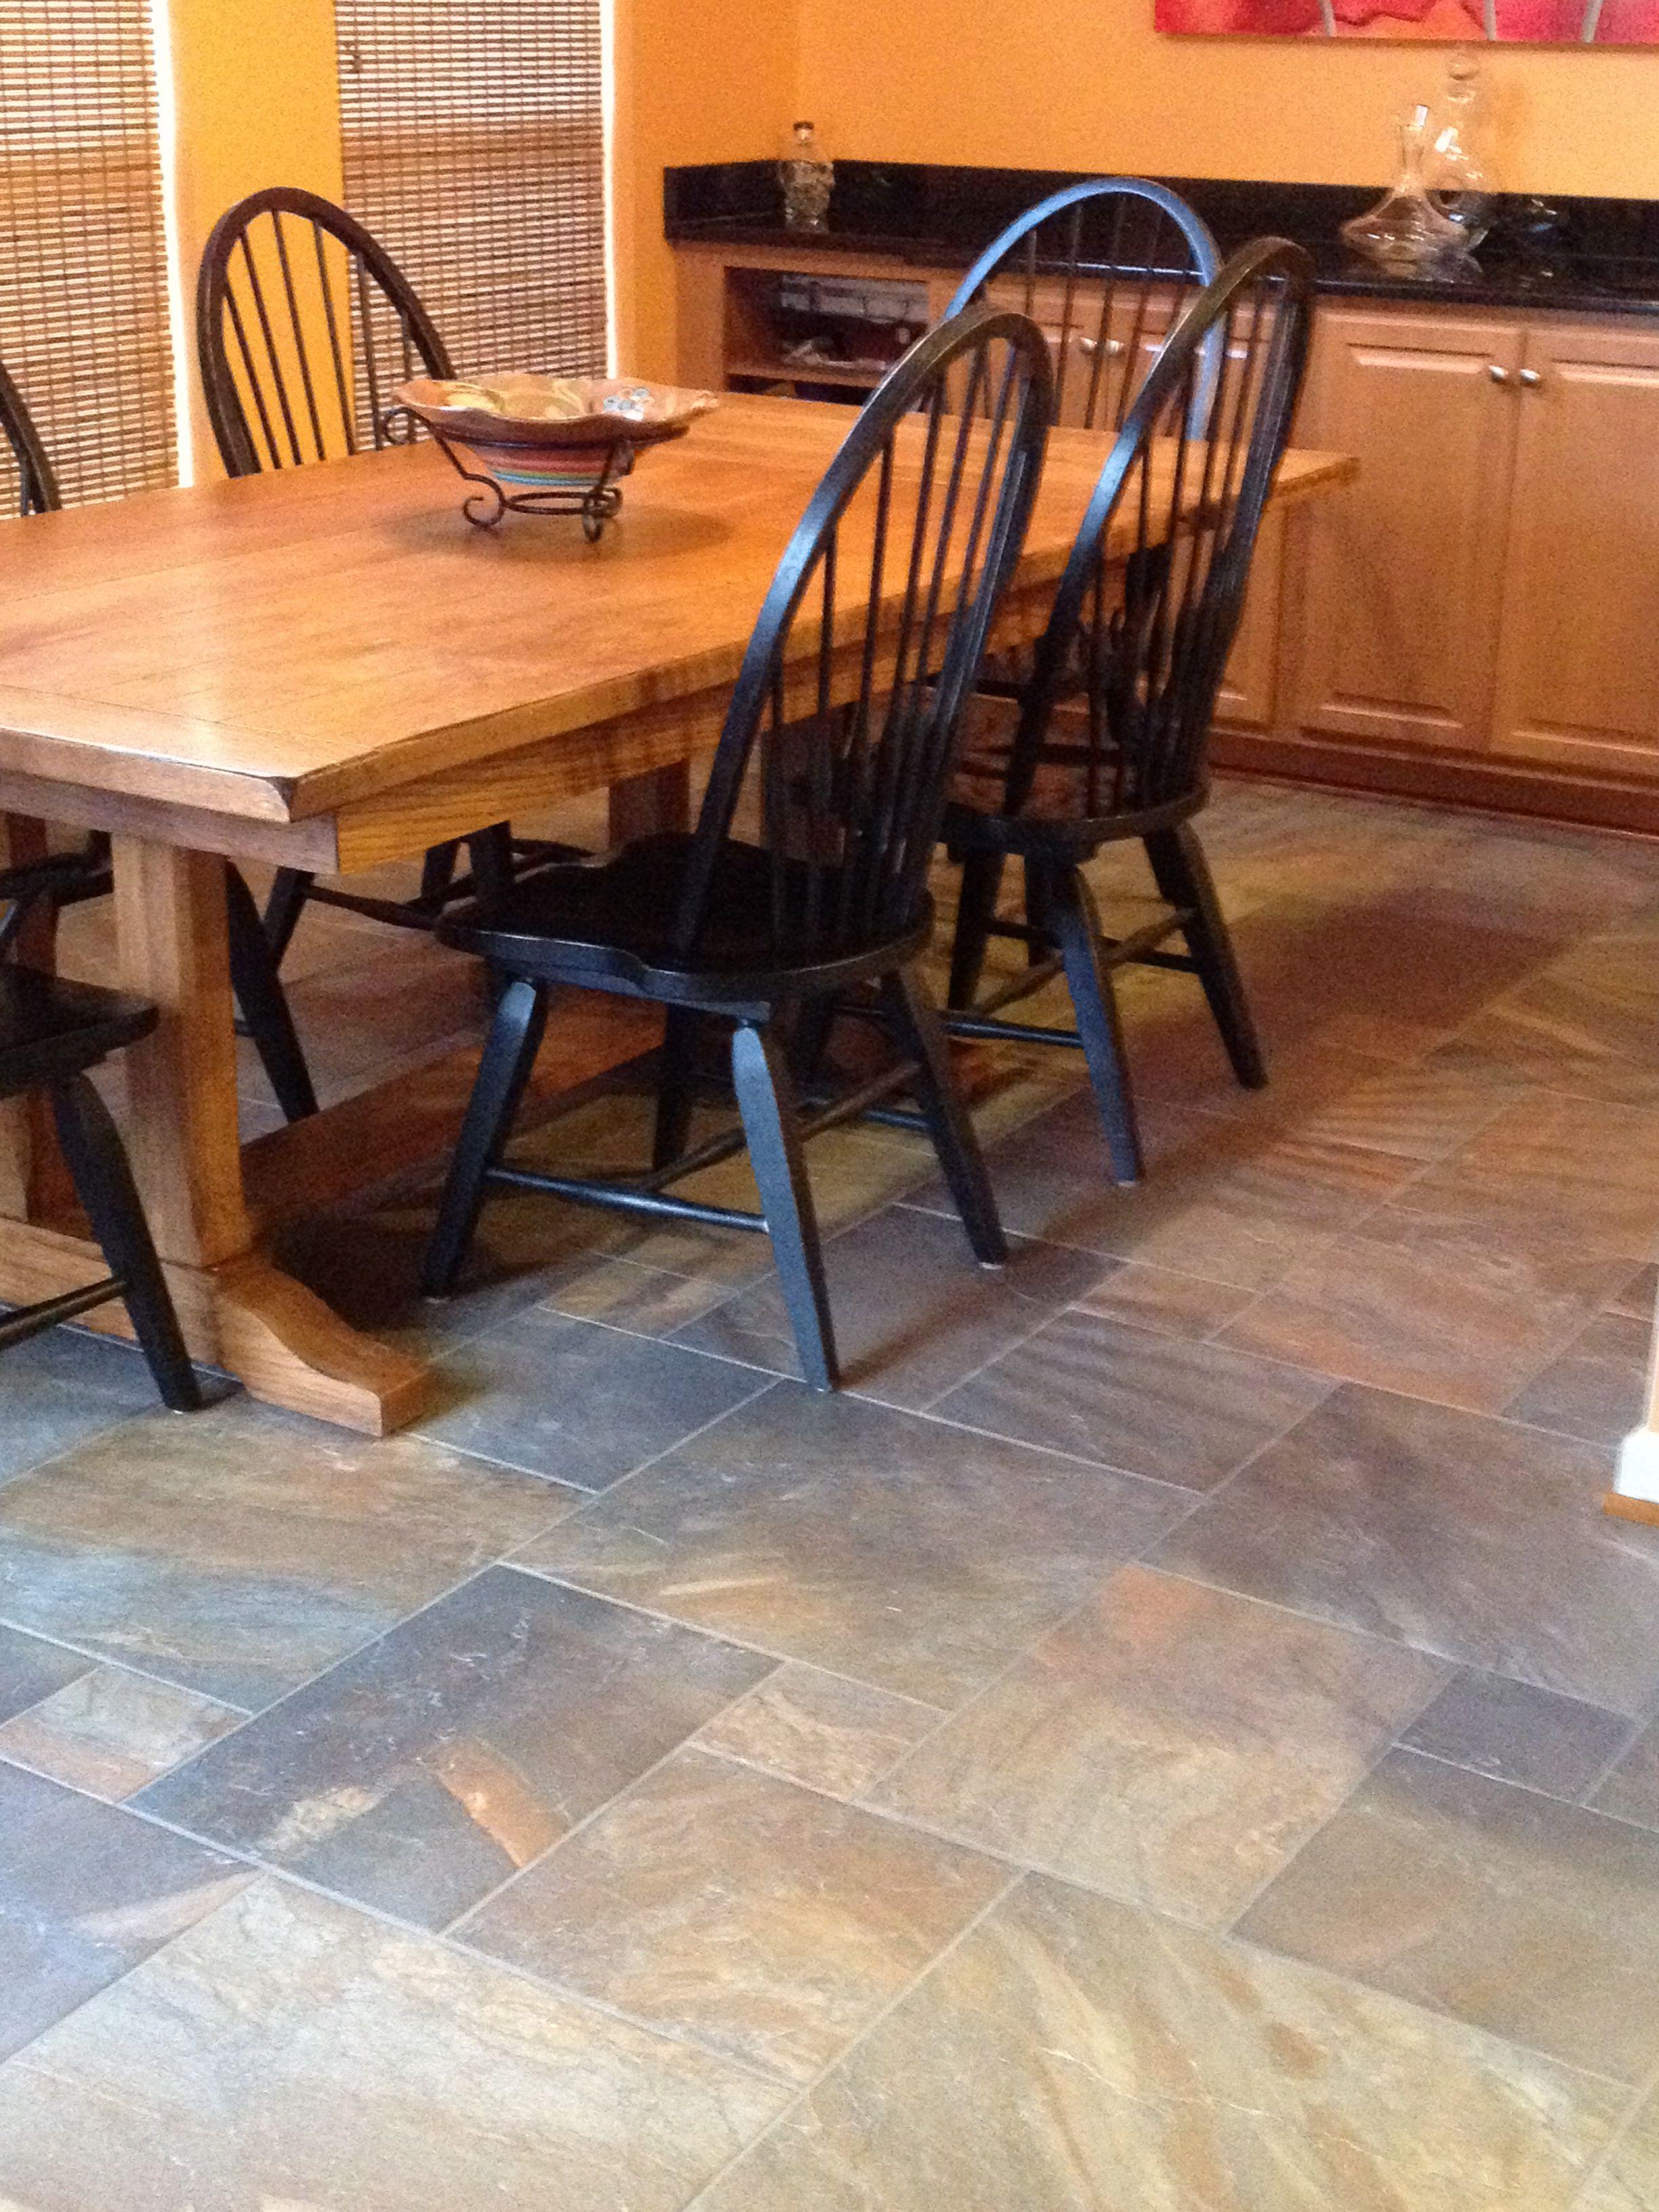 New Floors Daltile Ayers Rock Rustic Remnant Looks Like